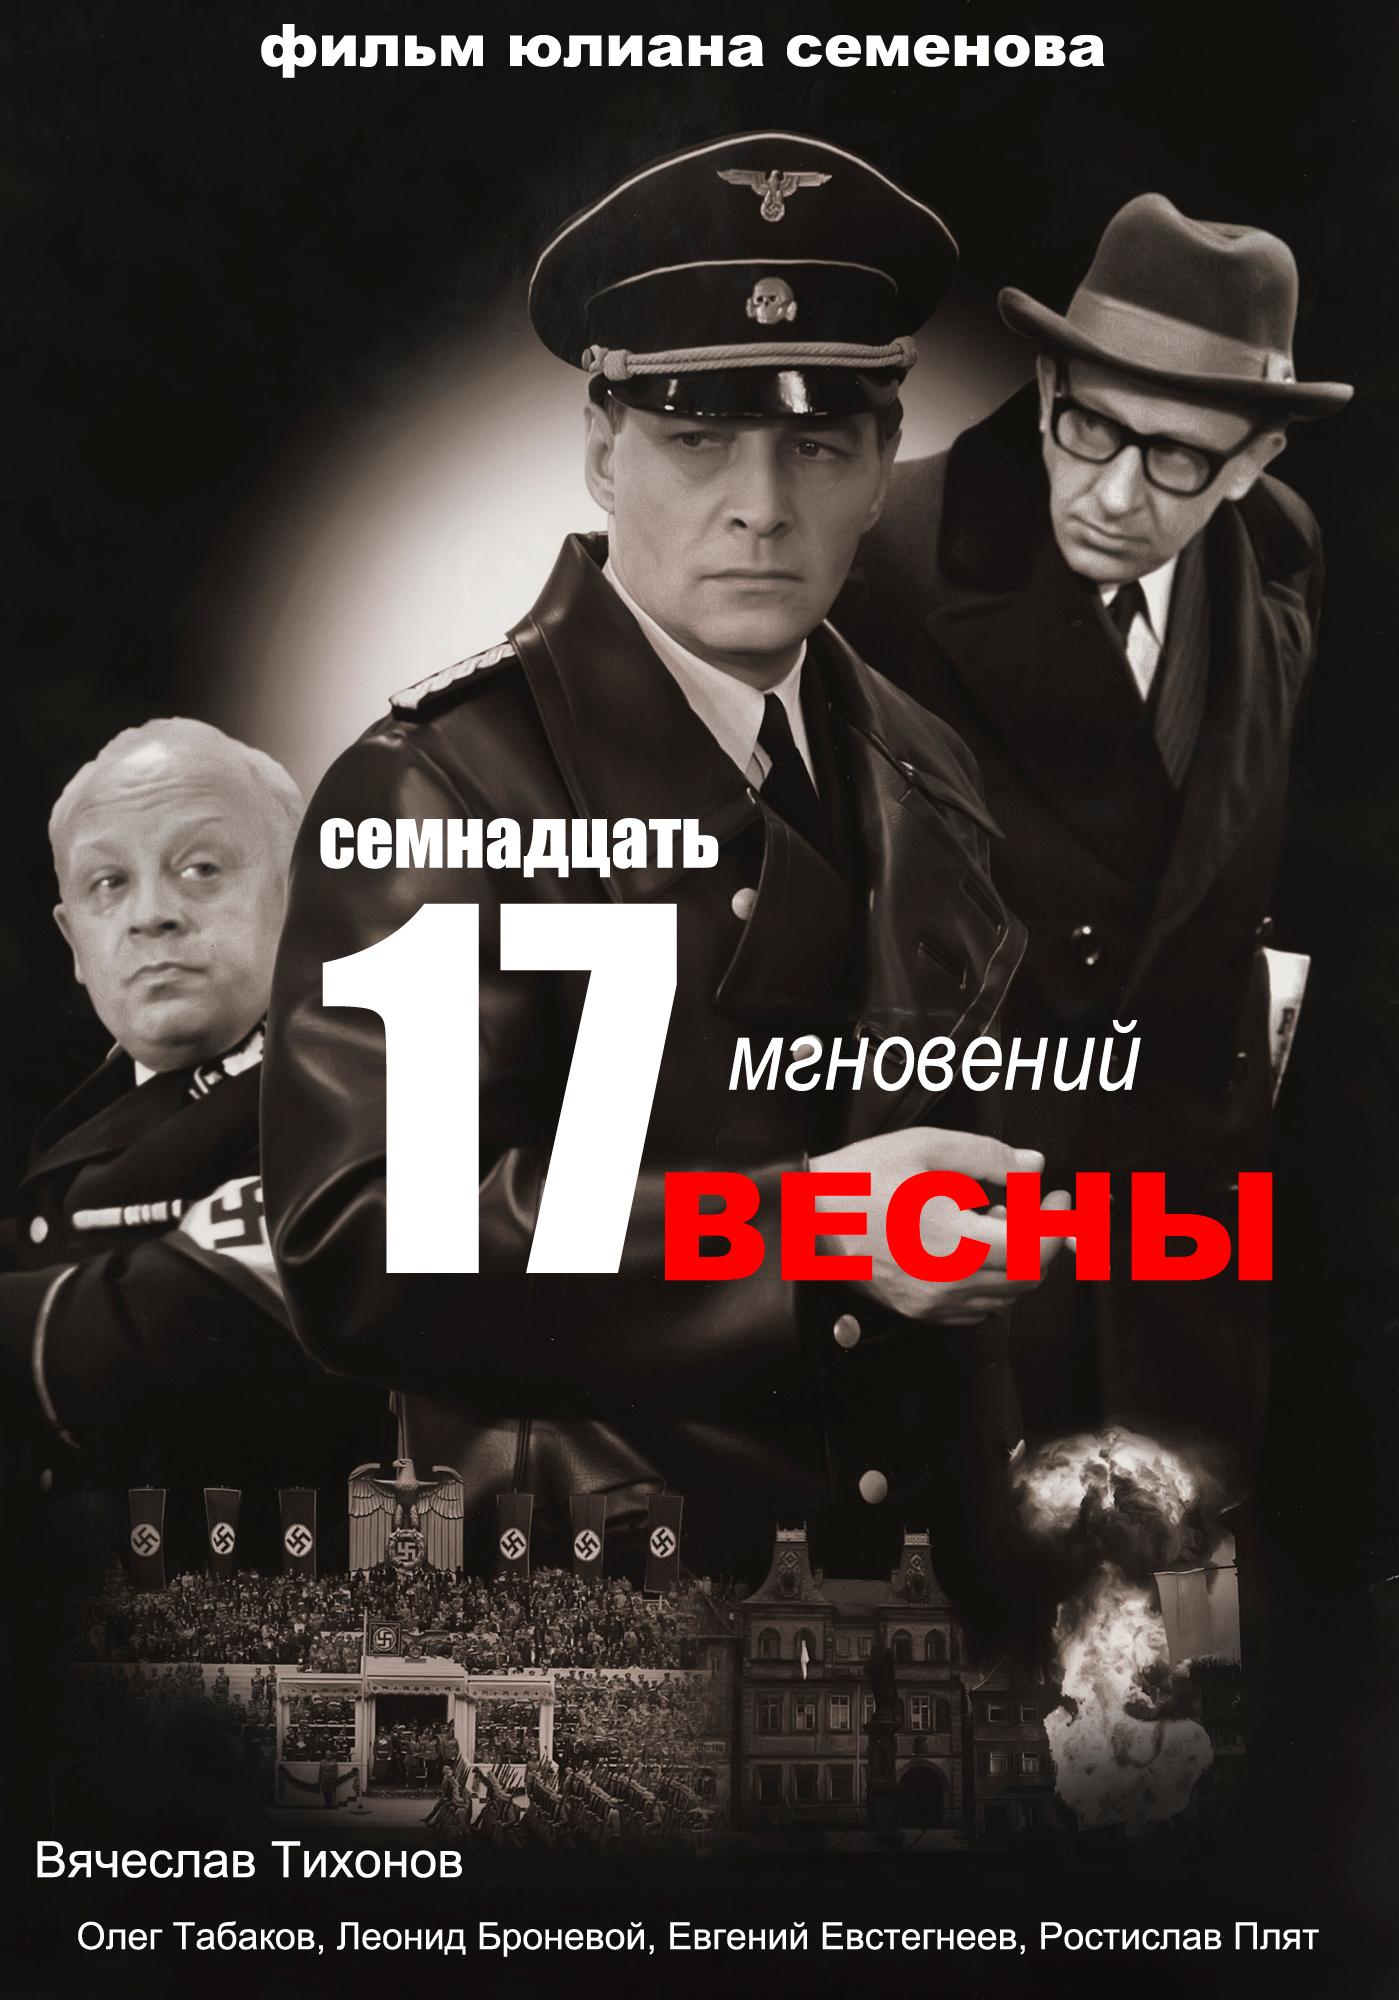 17-mgnovenii-vesny_2000x1399